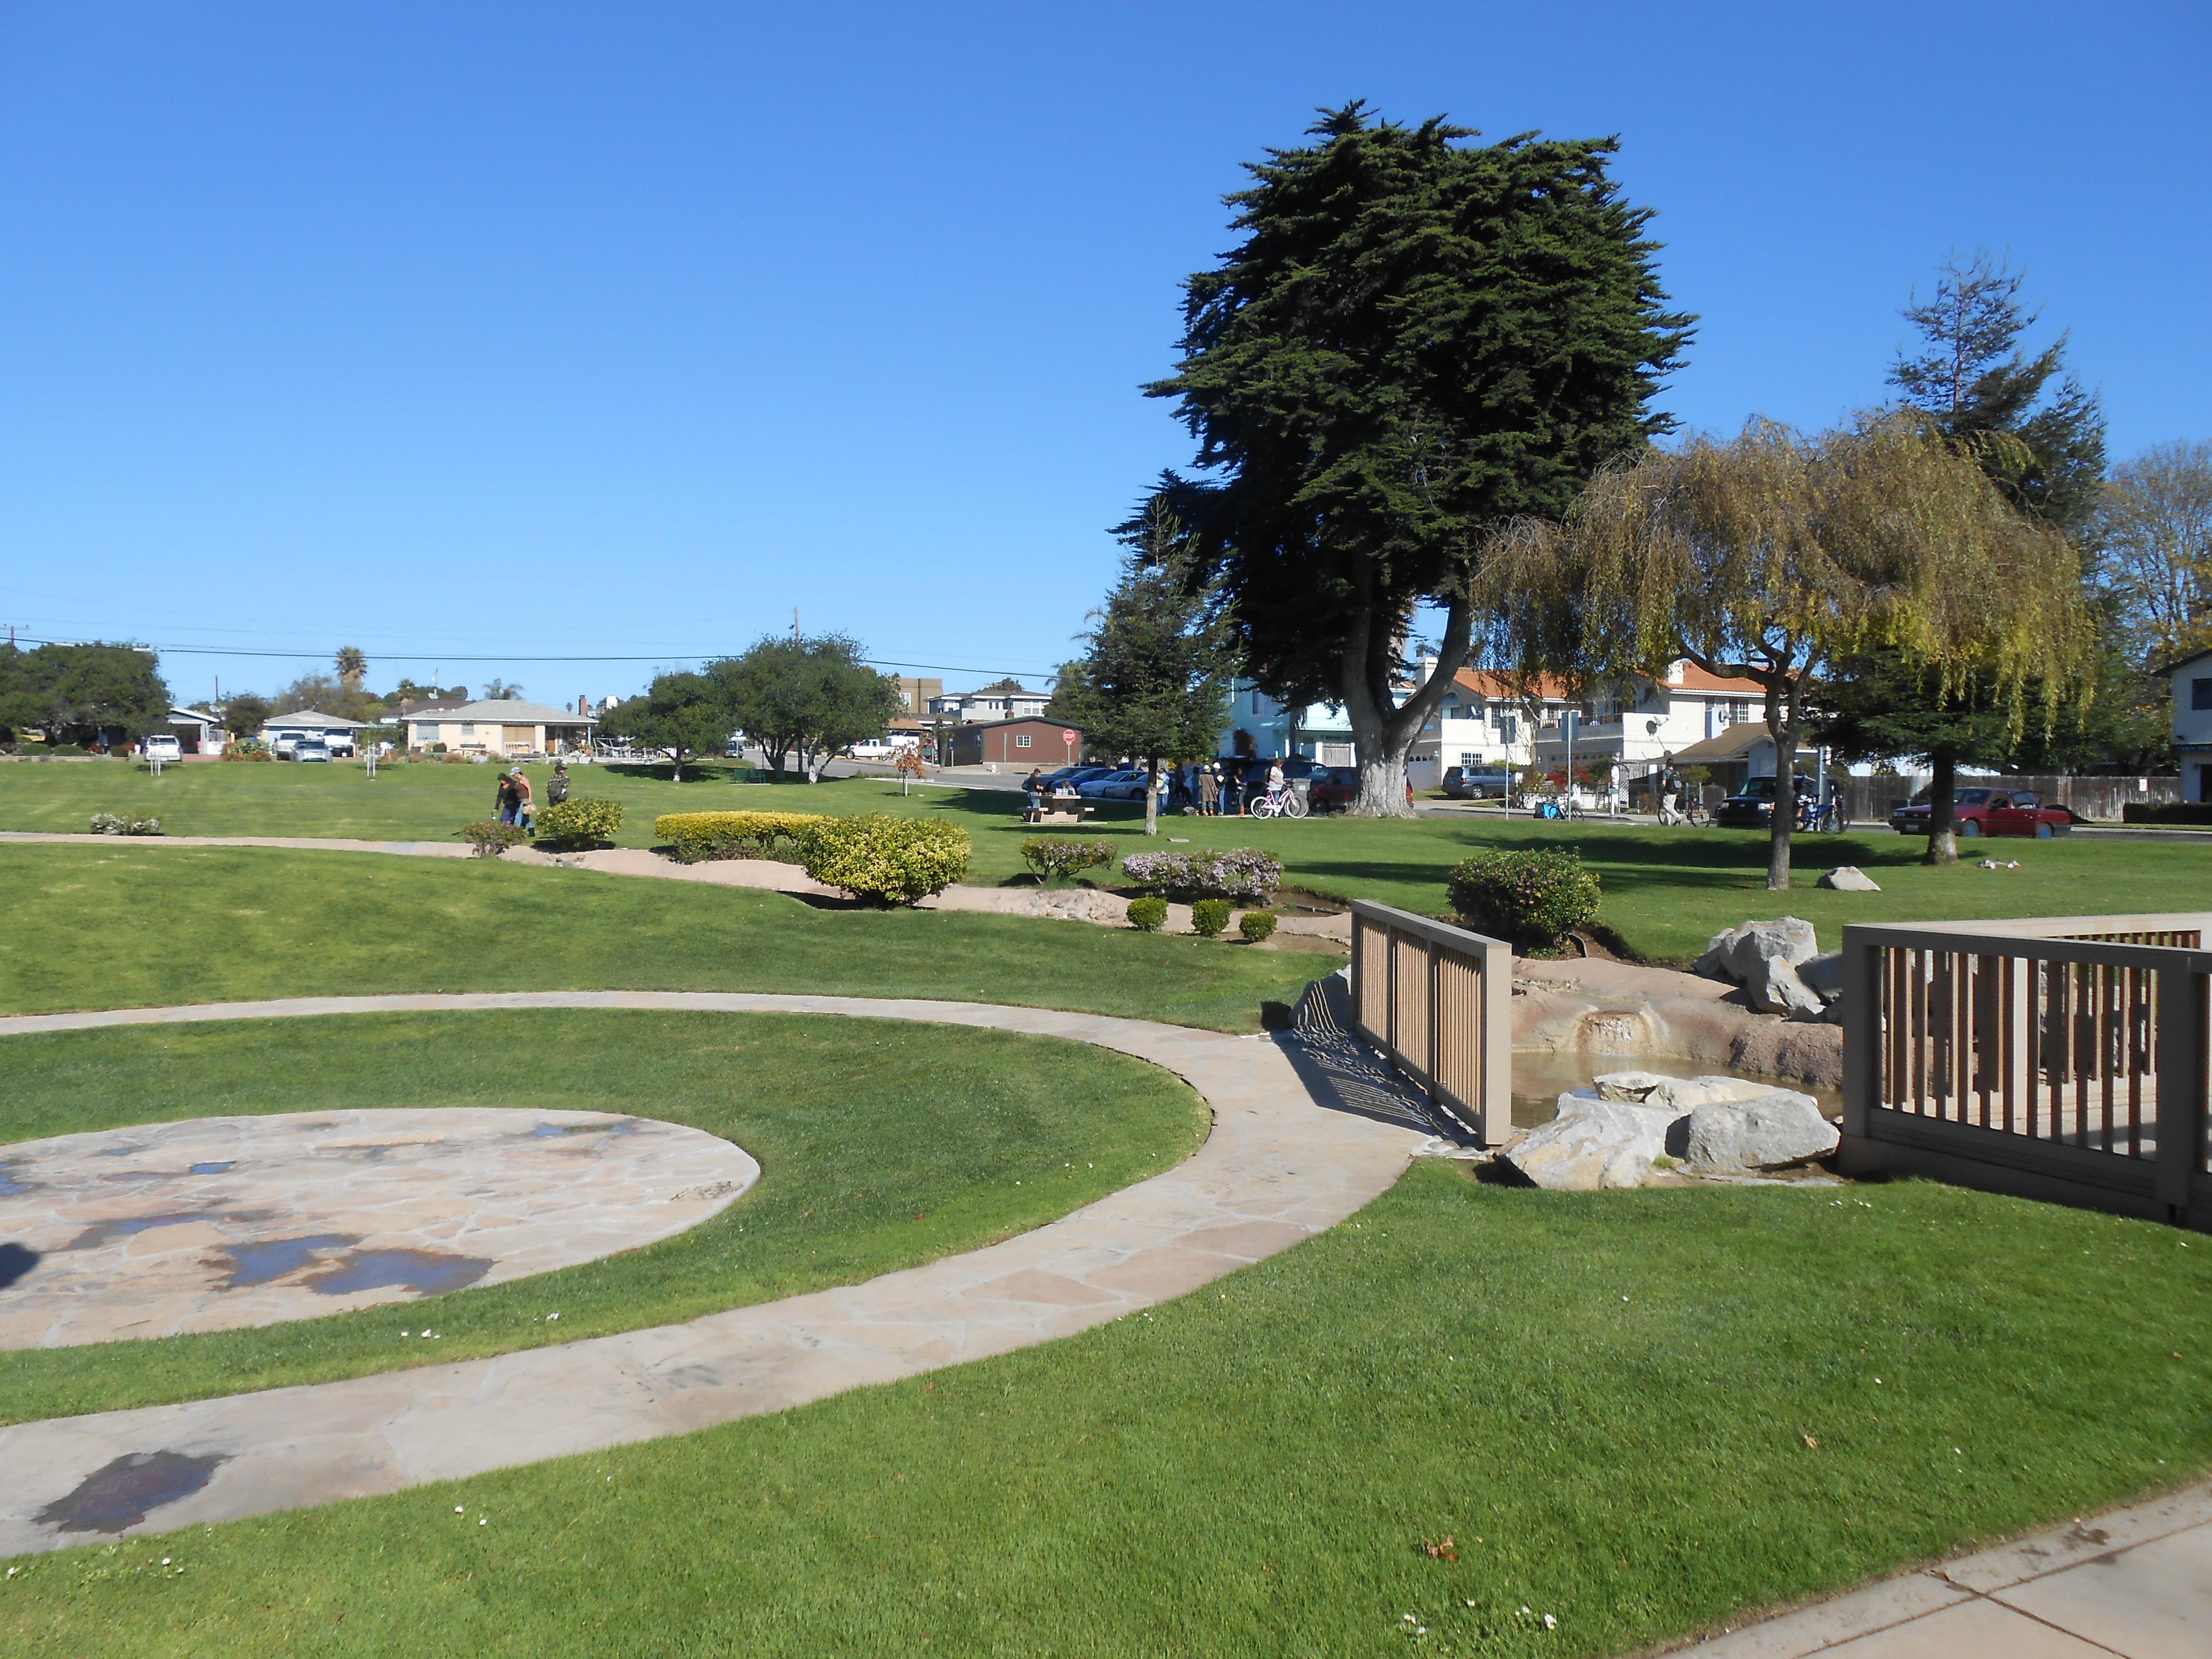 File:Ramona Garden Park in Grover Beach.JPG - Wikimedia Commons